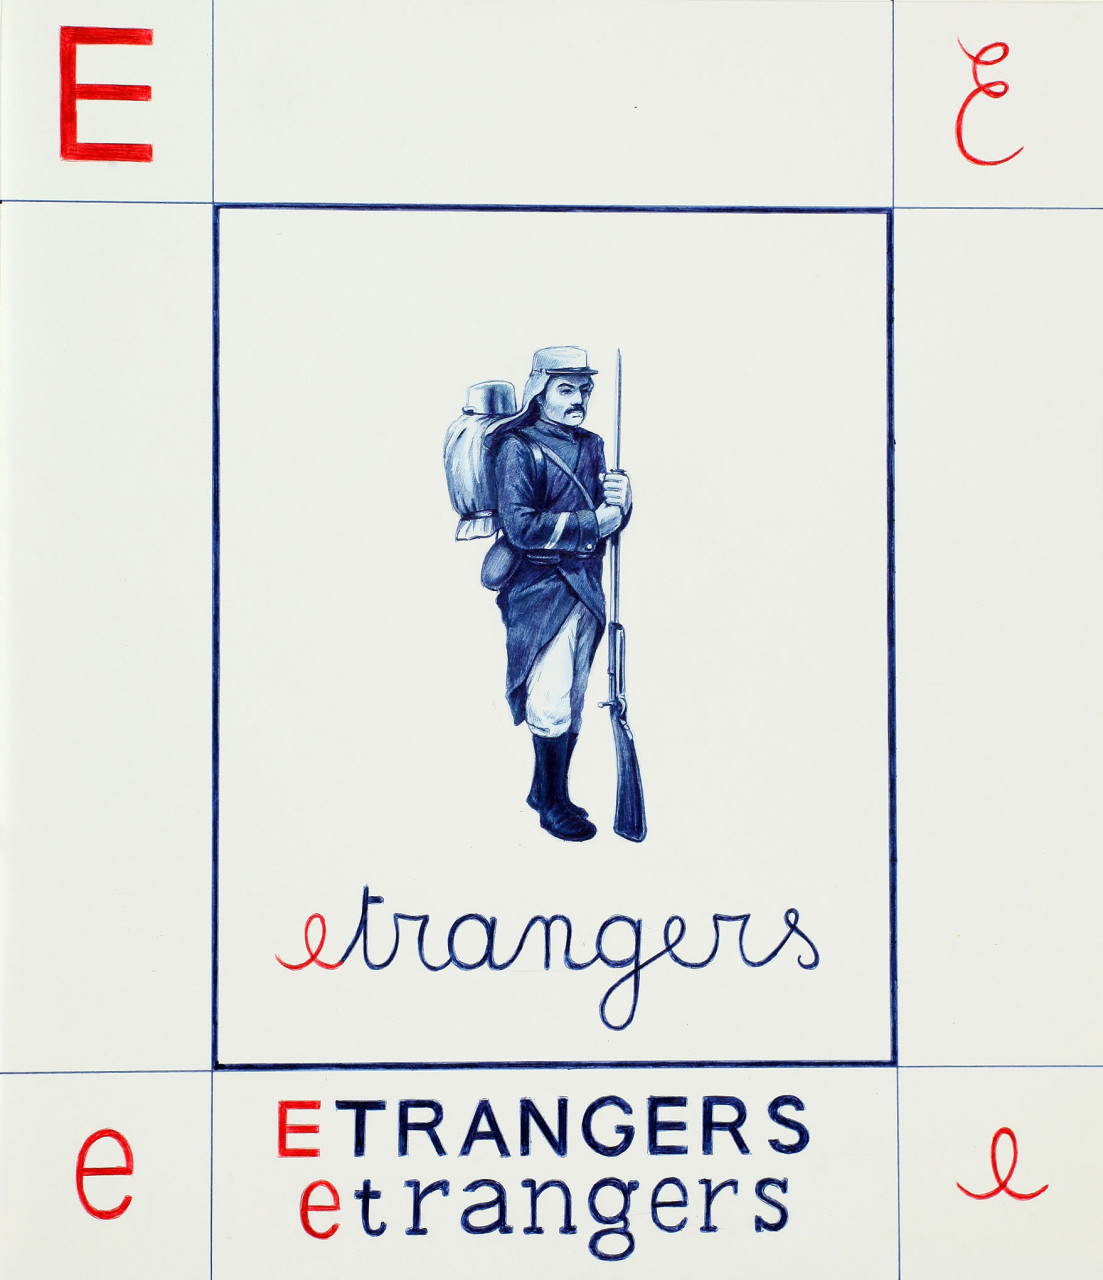 11E-etrangers_bassa